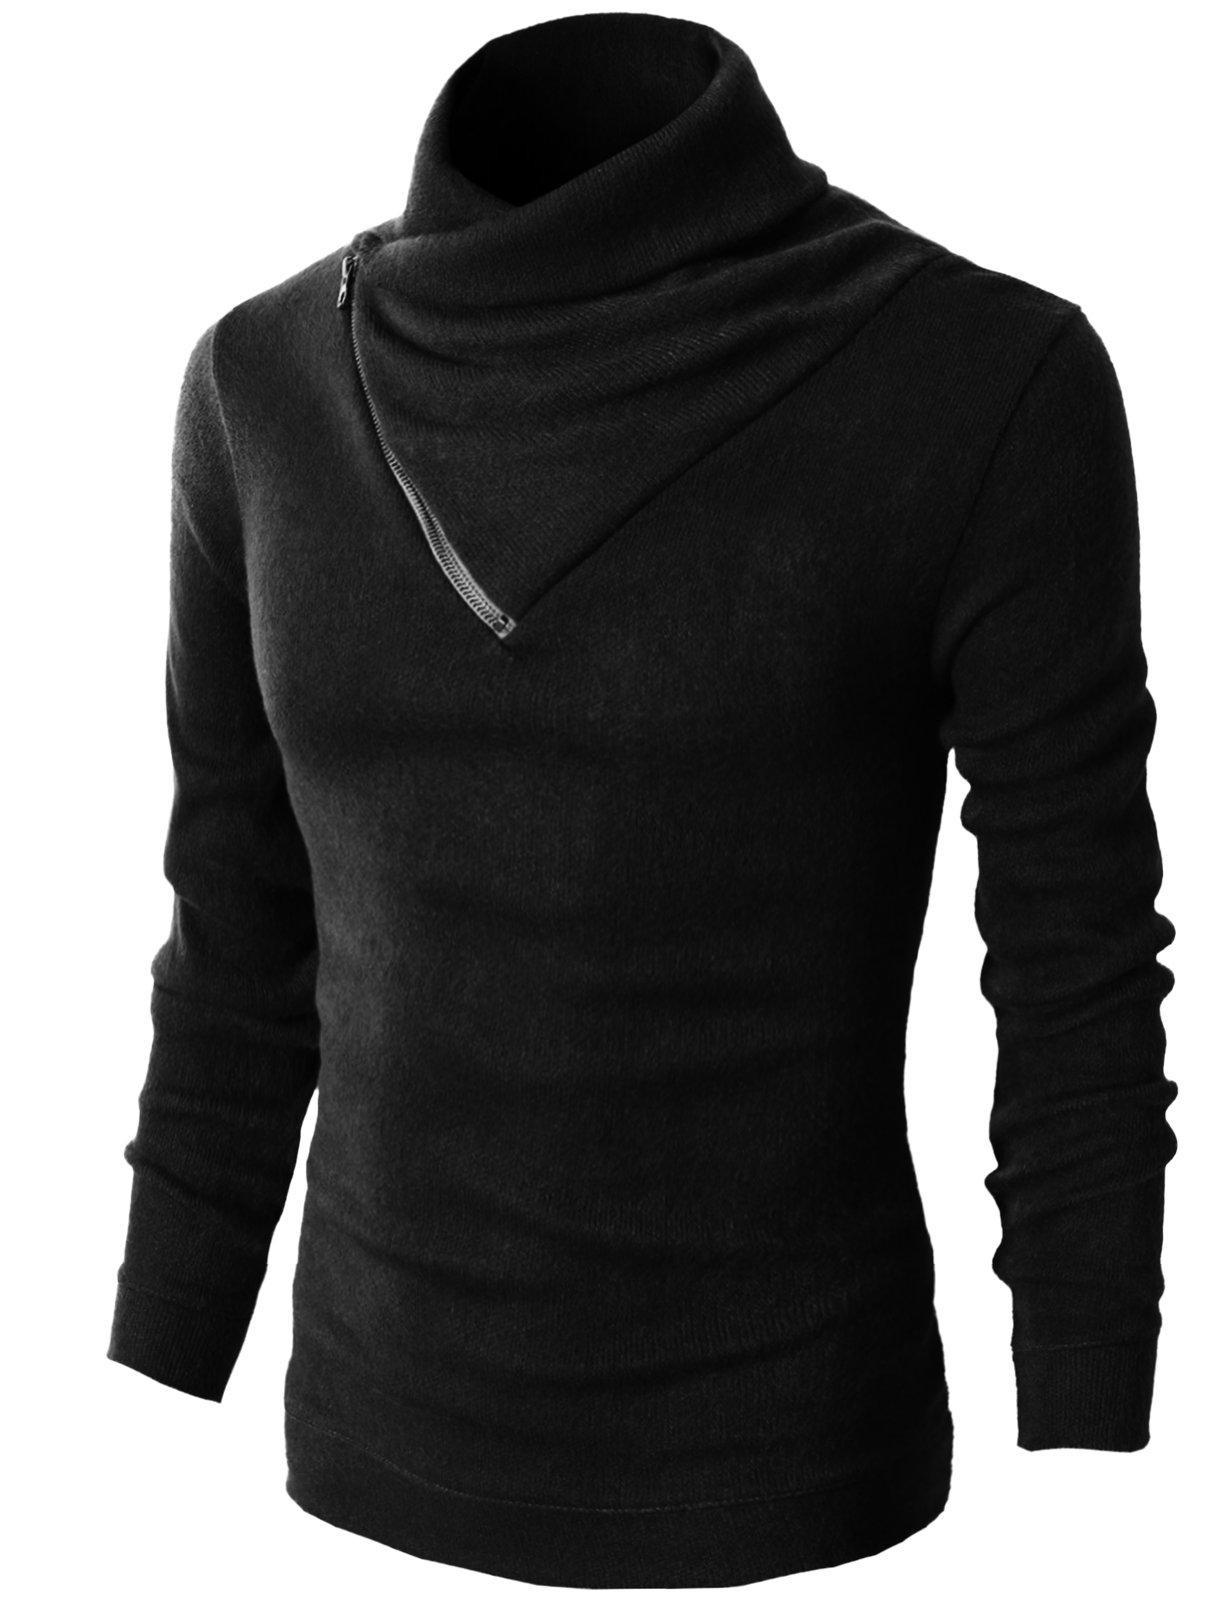 H2H Mens Fashion Turtleneck Slim Fit Pullover Sweater Oblique Line Bottom Edge BLACK US M/Asia L (KMTTL041)